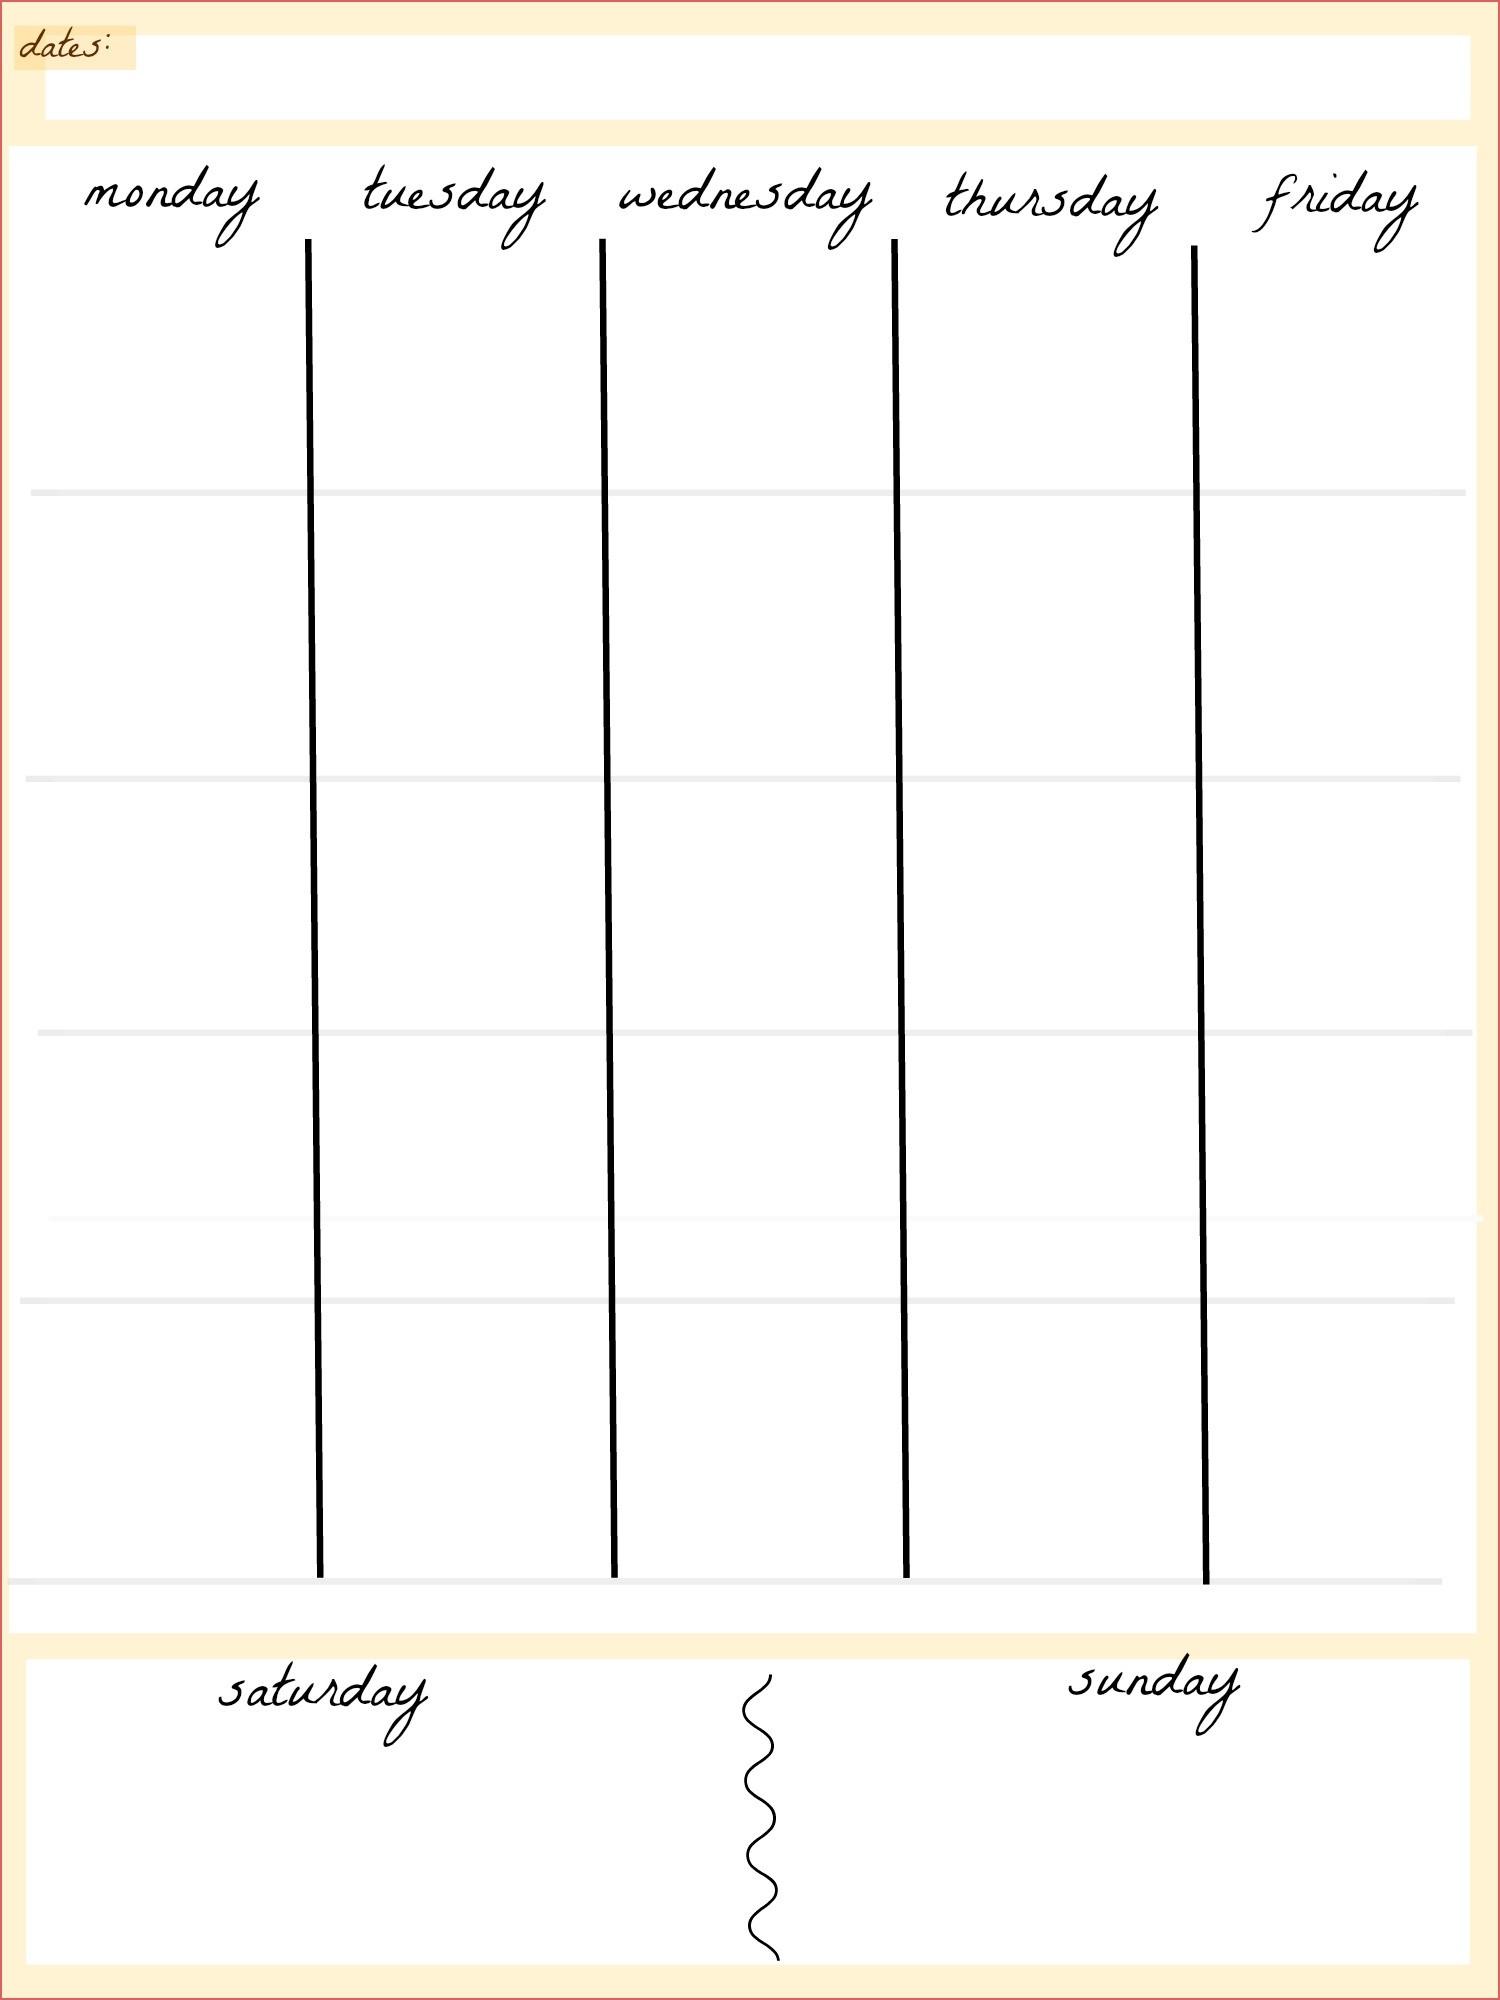 Day Calendar Printable Blank 5 Day Calendar Printable Calendar pertaining to Blank Calendar Printable 5 Day